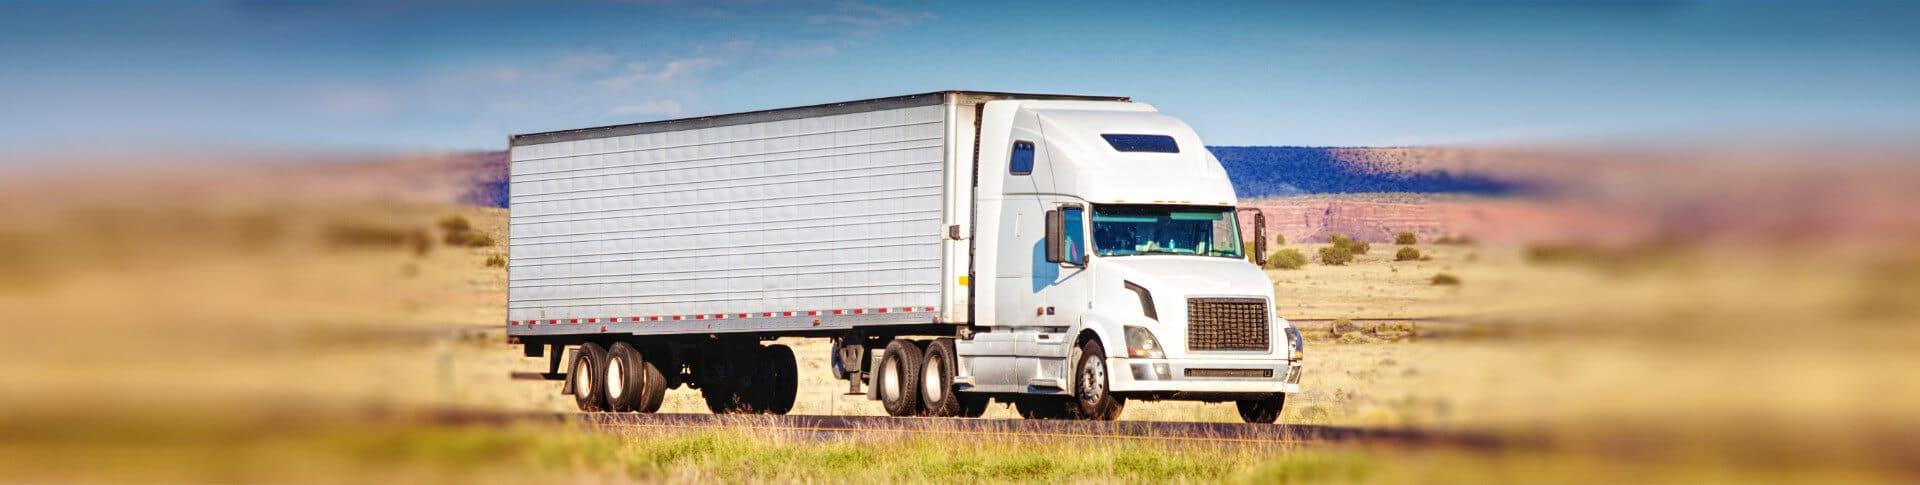 SOAP Camiones | soapcamion.cl